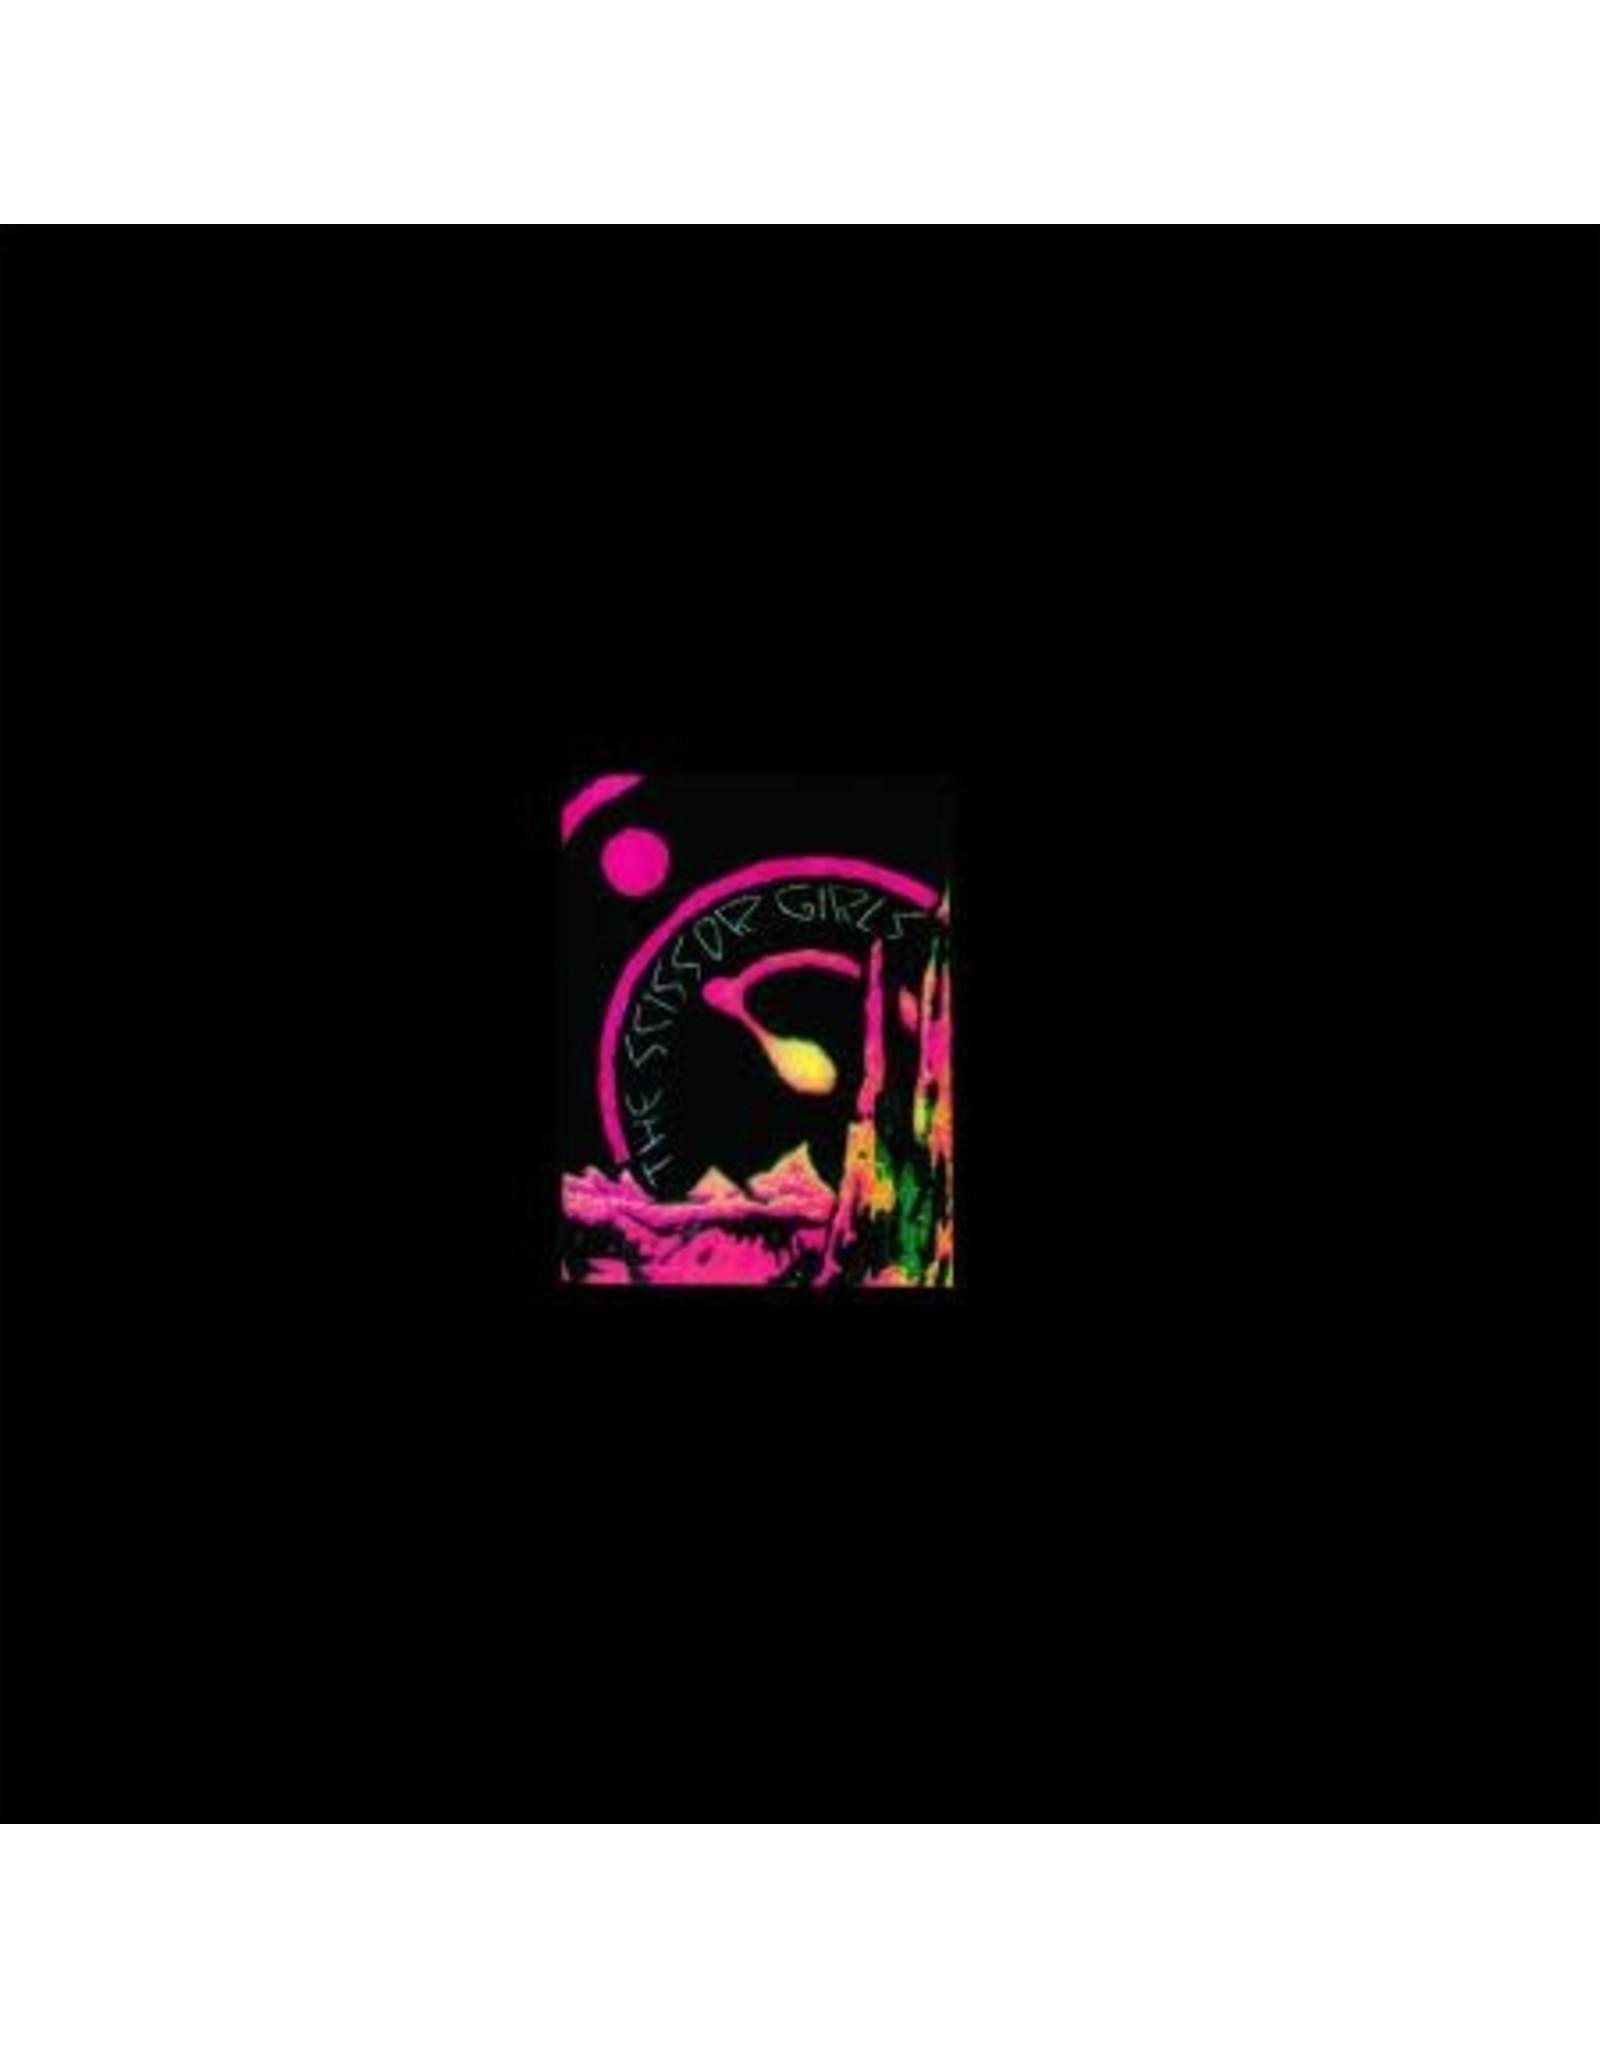 New Vinyl The Scissor Girls - S/T LP